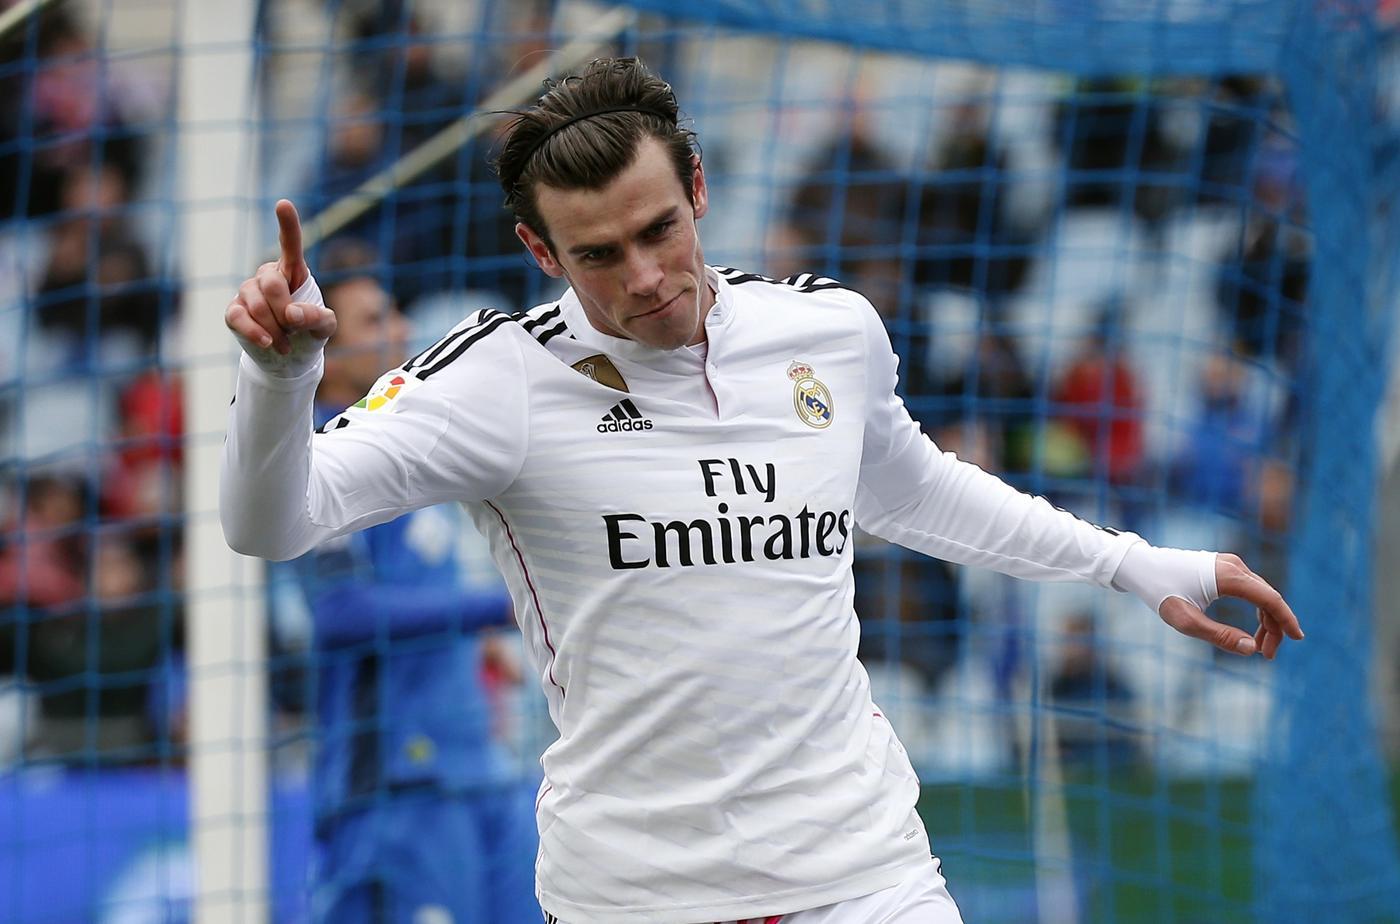 Gareth Bale: I have no interest in Manchester United transfer